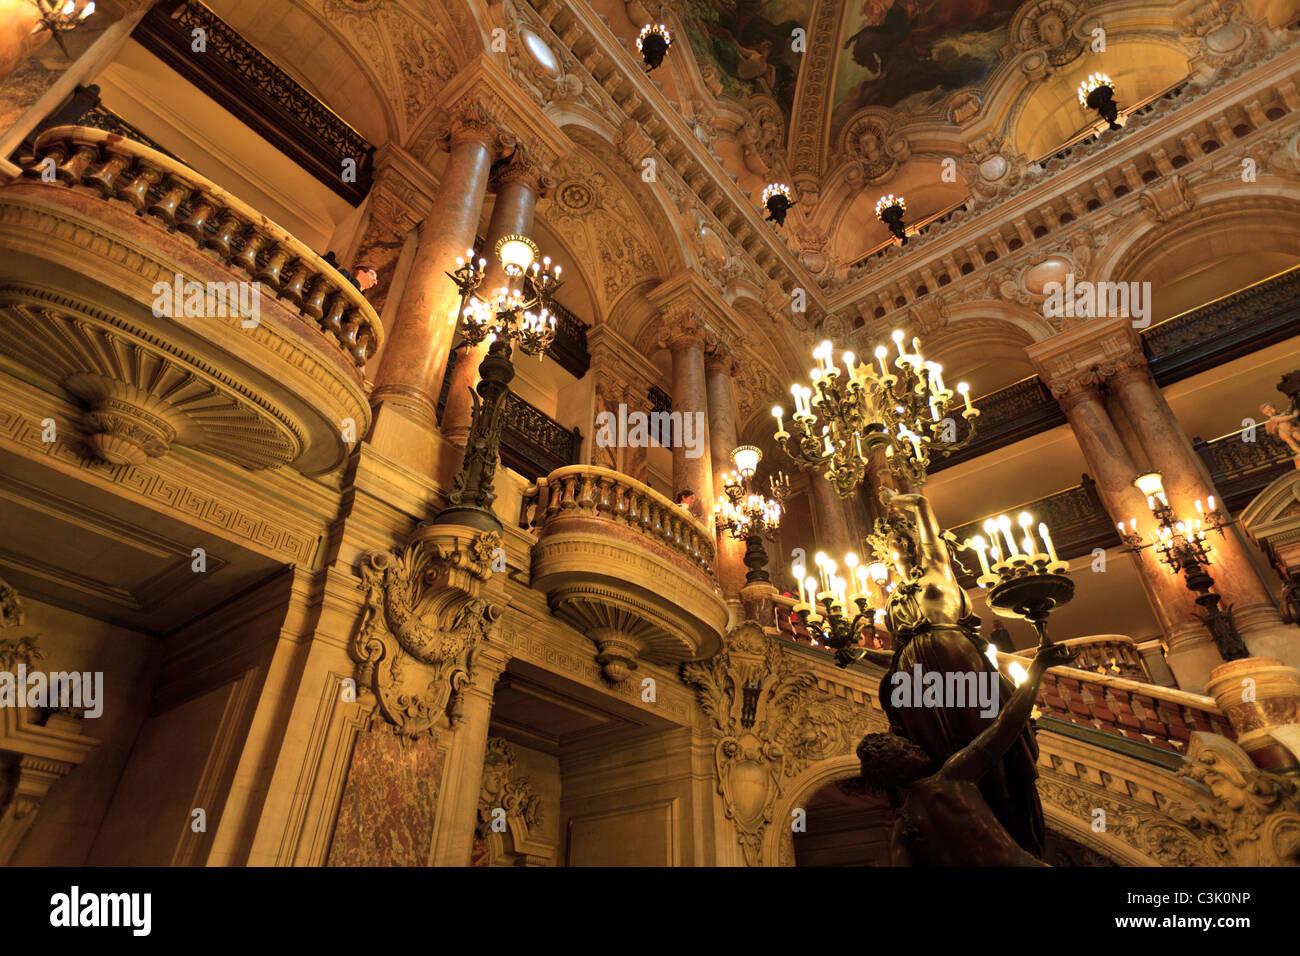 Interior of the Opera Garnier, Paris, France - Stock Image